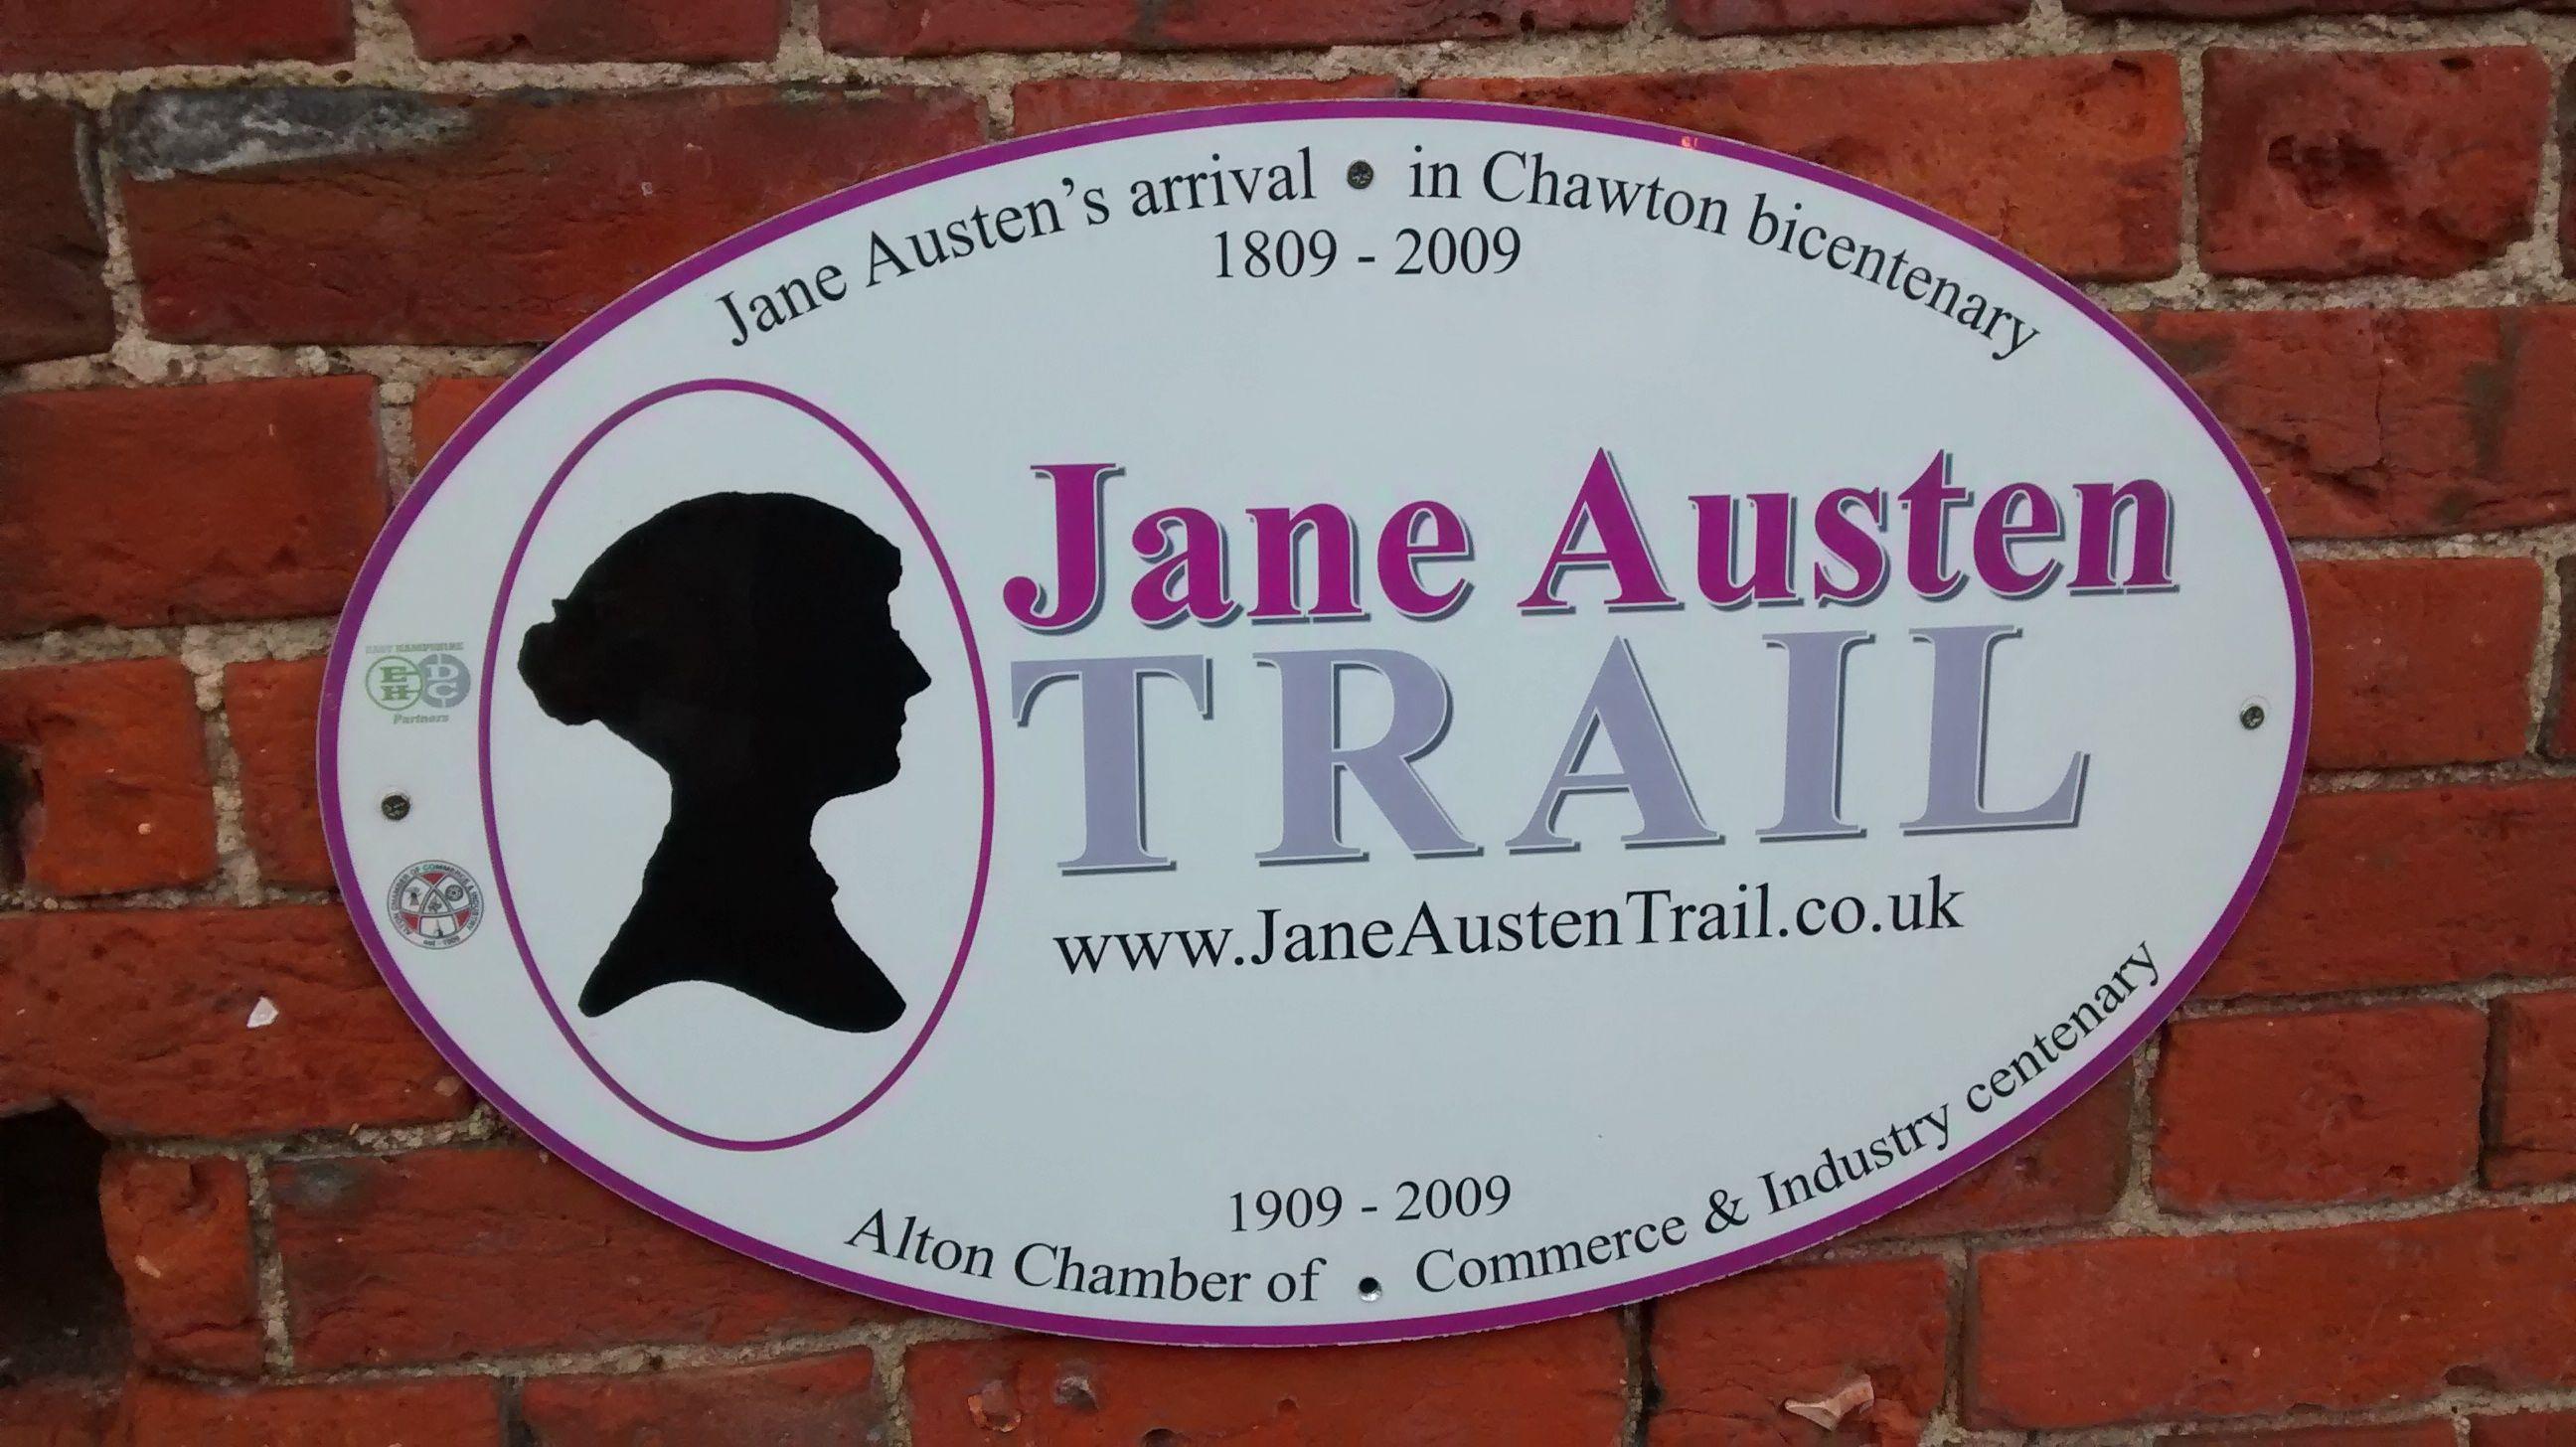 #JaneAustenTrail #Chawton #JaneAustenHouse